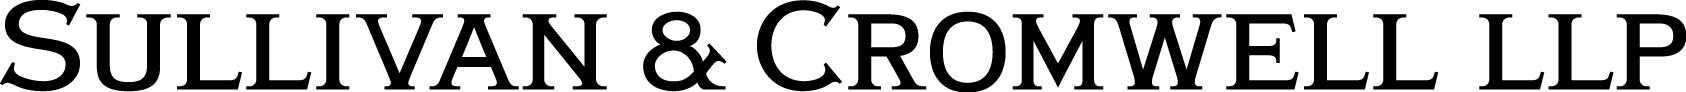 sullivan cromwell logo